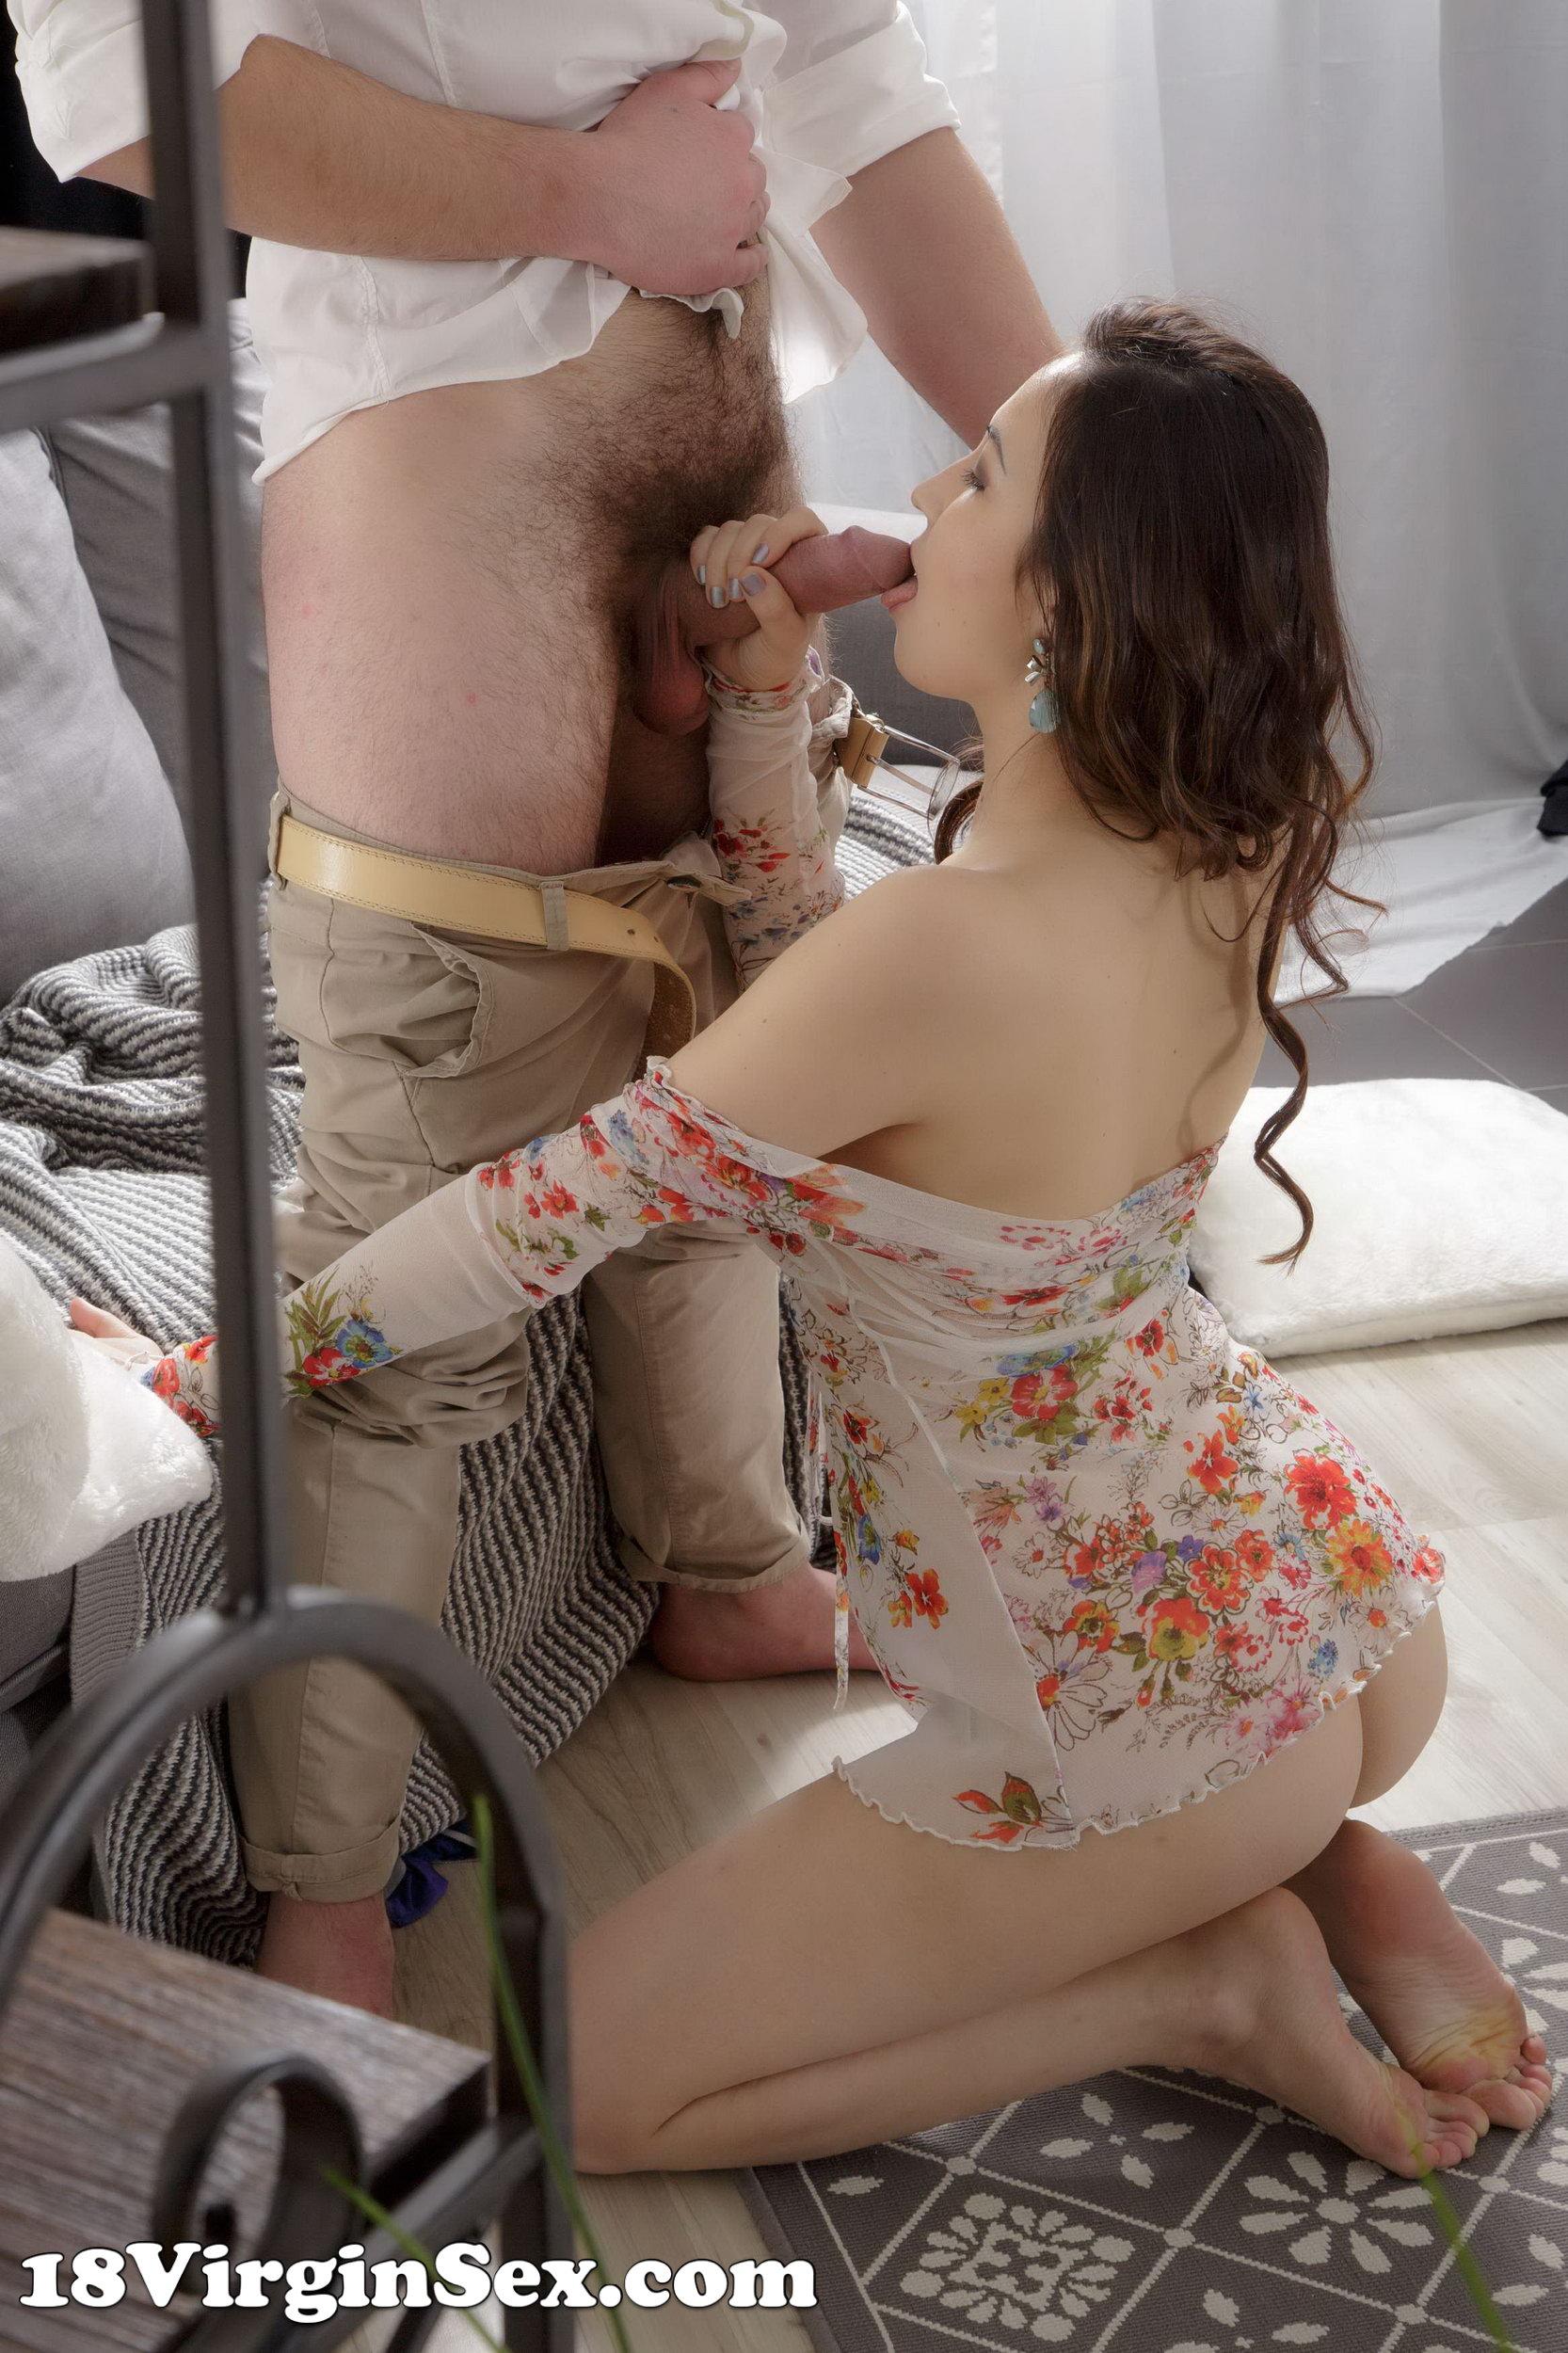 punjabi sexgirl and boy